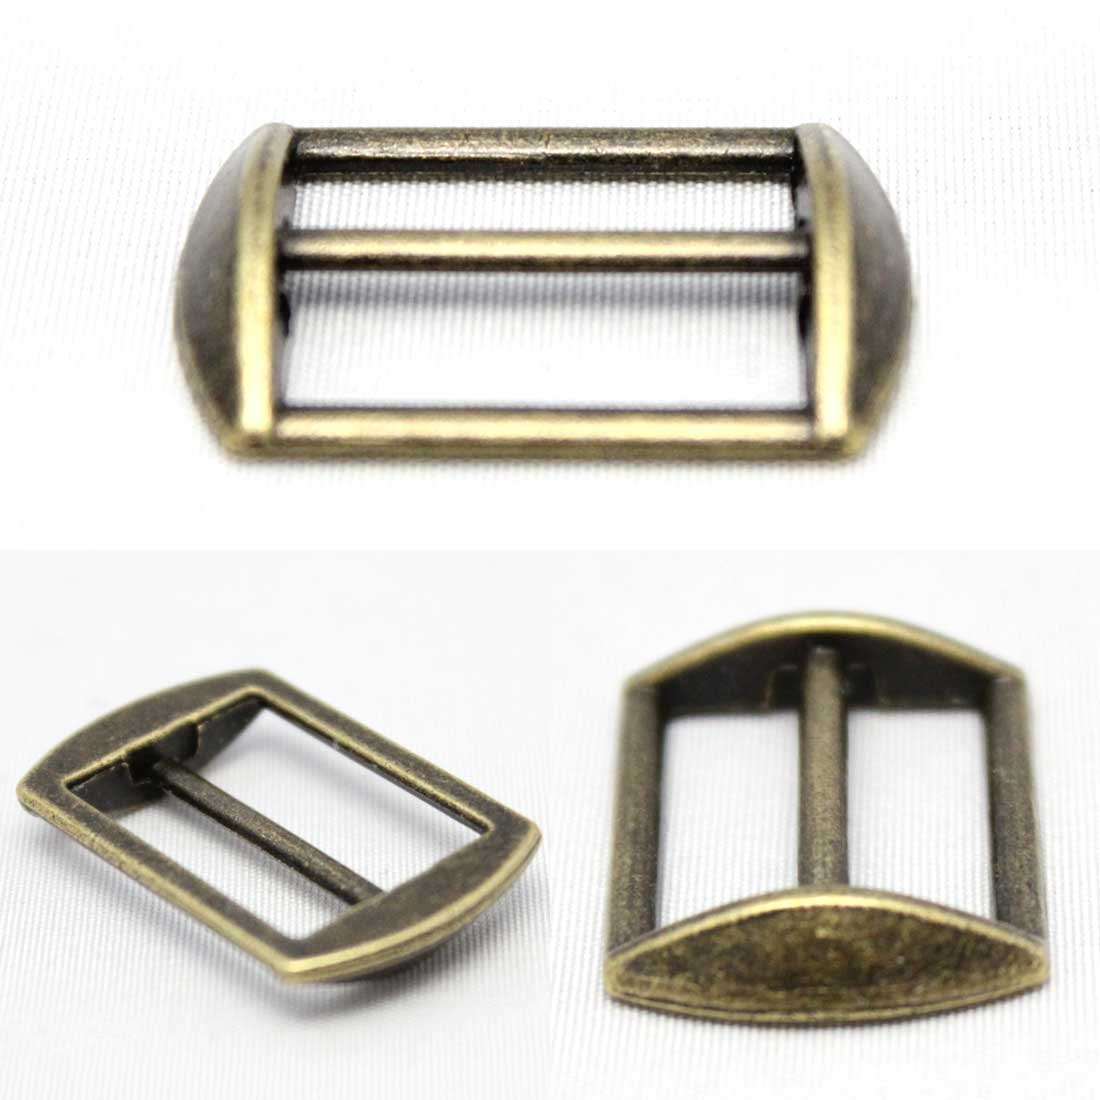 5mm sgy-304-2(手工艺手工艺用品手工艺素材零件手佣人古董素材连接零